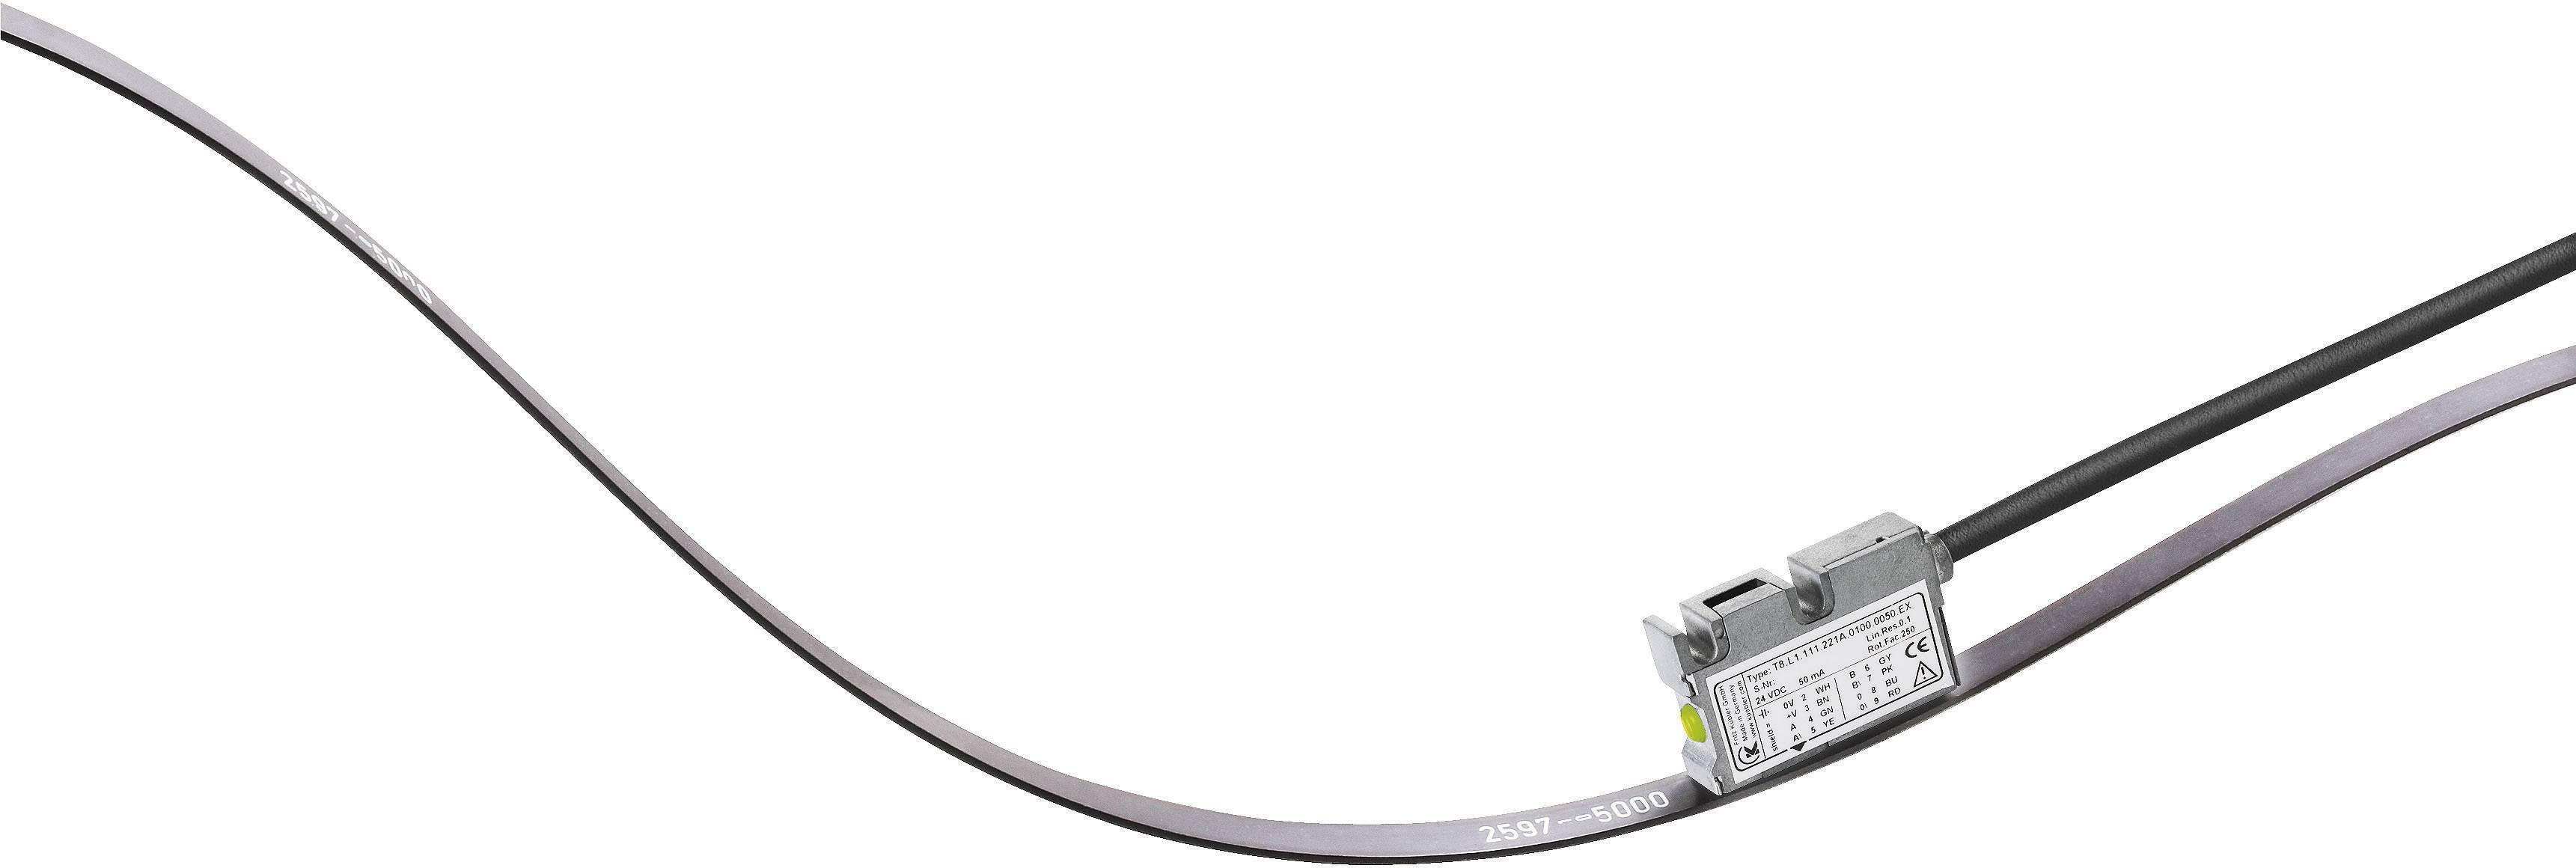 Lineárny merací magnetický systém Kübler LIMES LI20, rozhranie RS422, 100 um